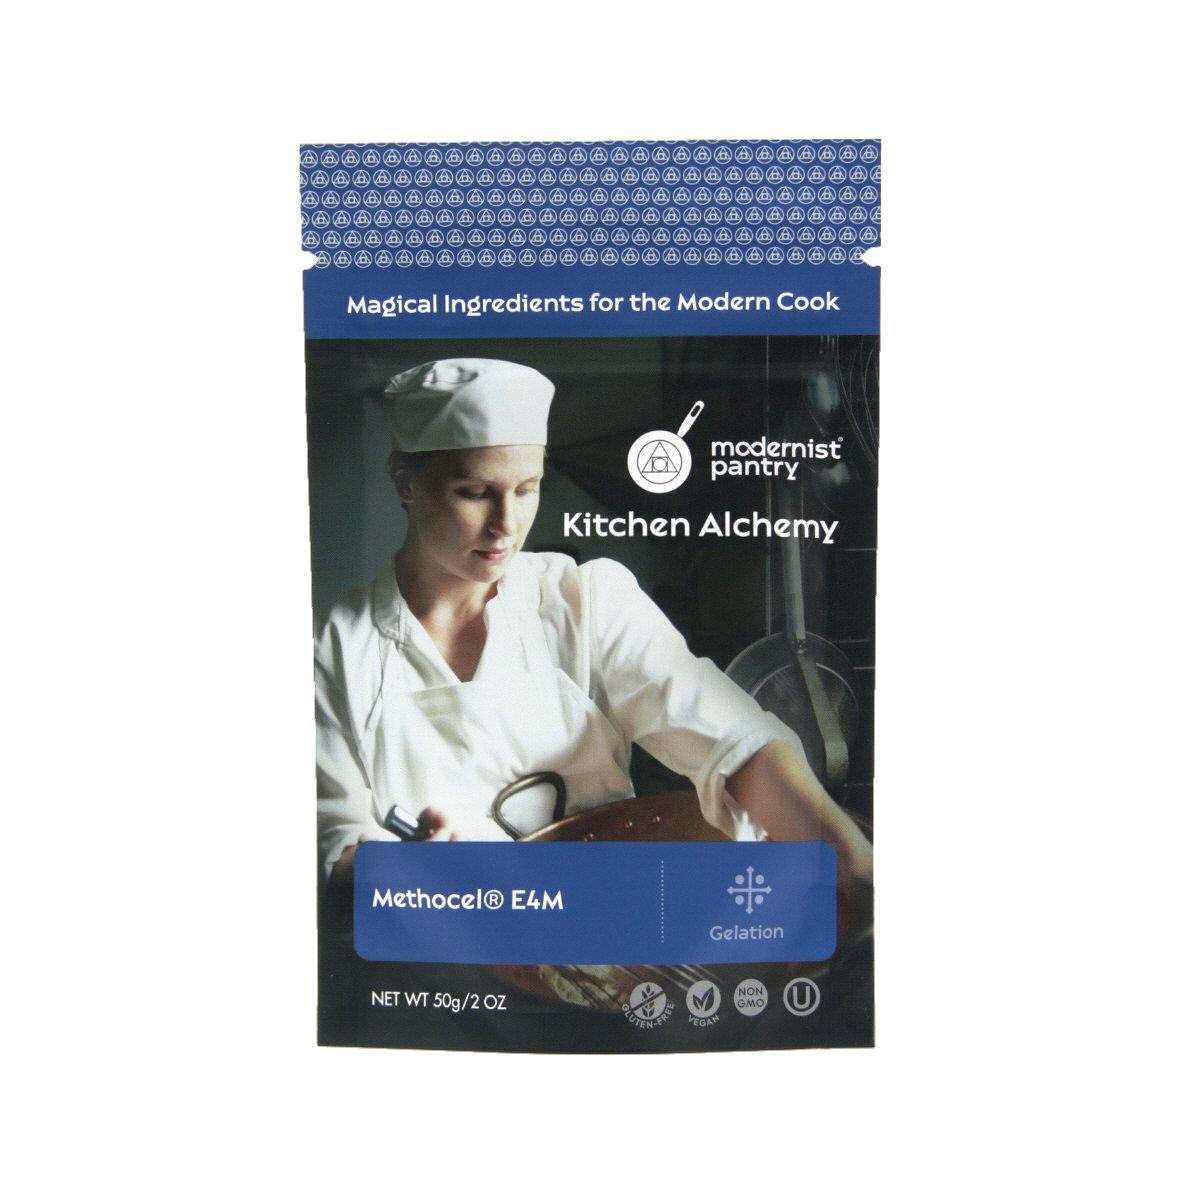 Methylcellulose - Methocel E4M ⊘ Non-GMO ☮ Vegan ✡ OU Kosher Certified - 50g/2oz